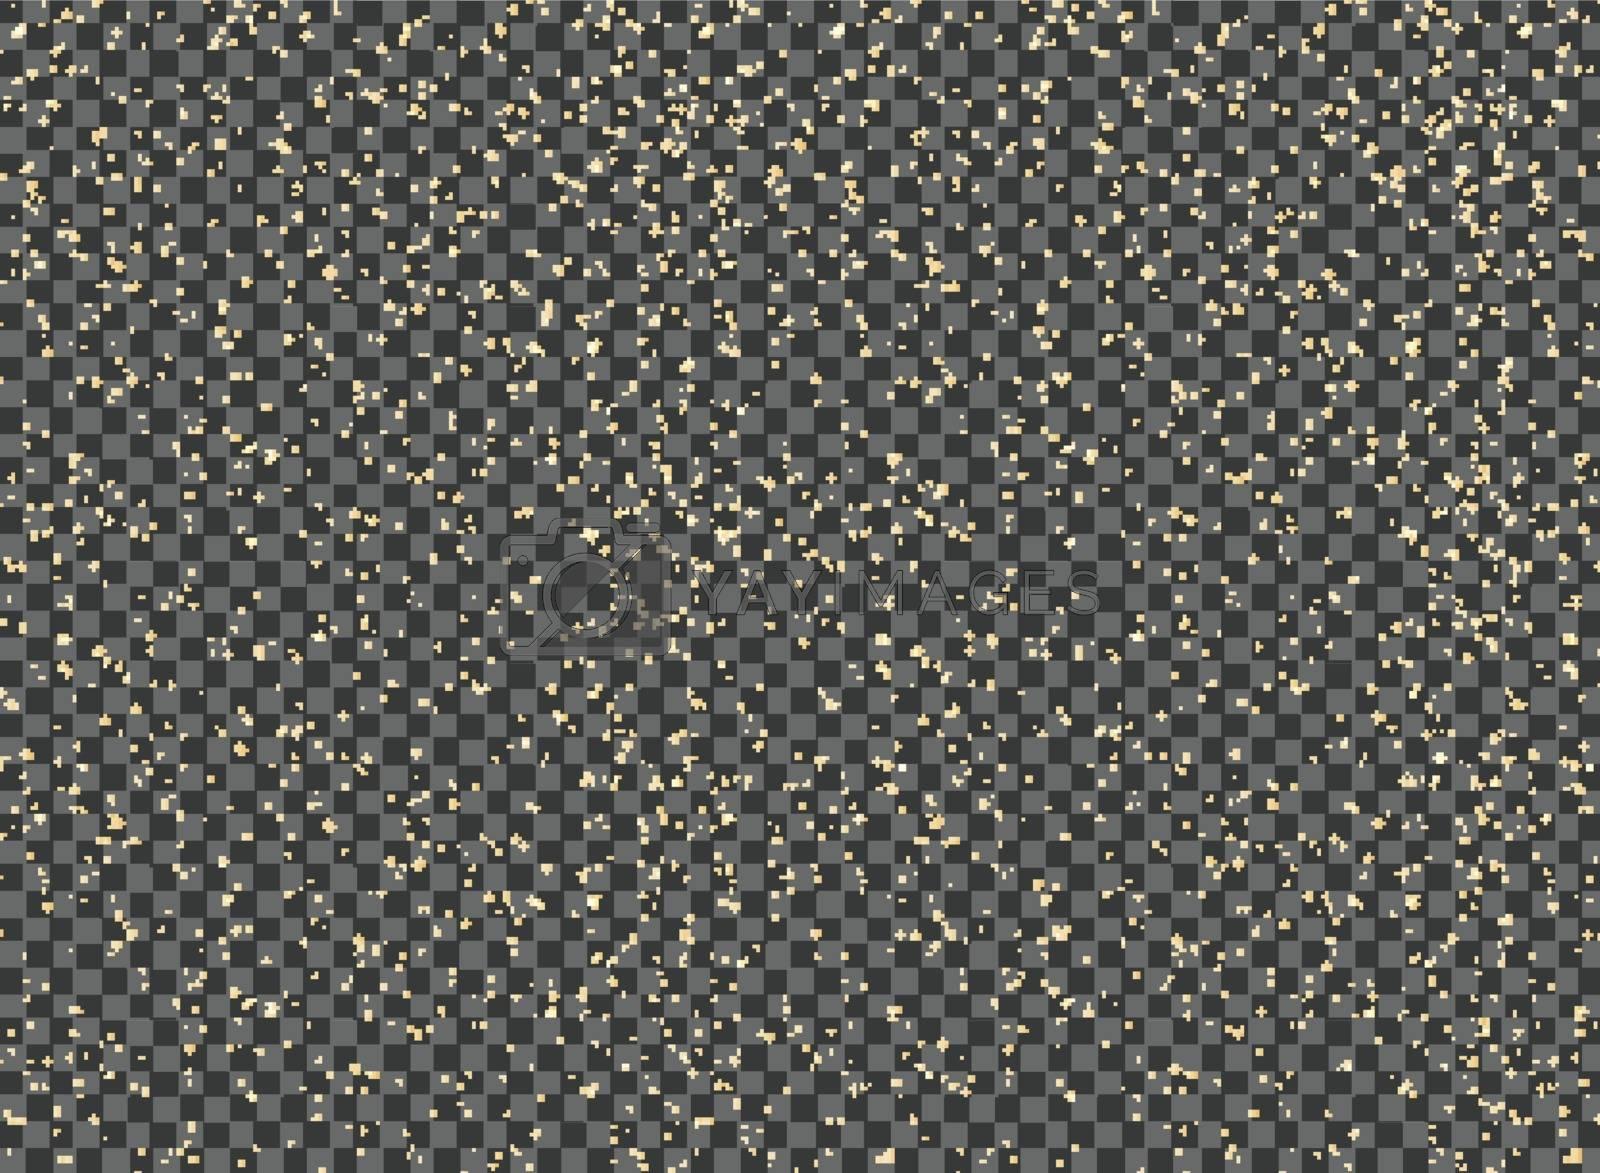 Abstract yellow paint splatter on transparent background. Glitter element. Vector illustration